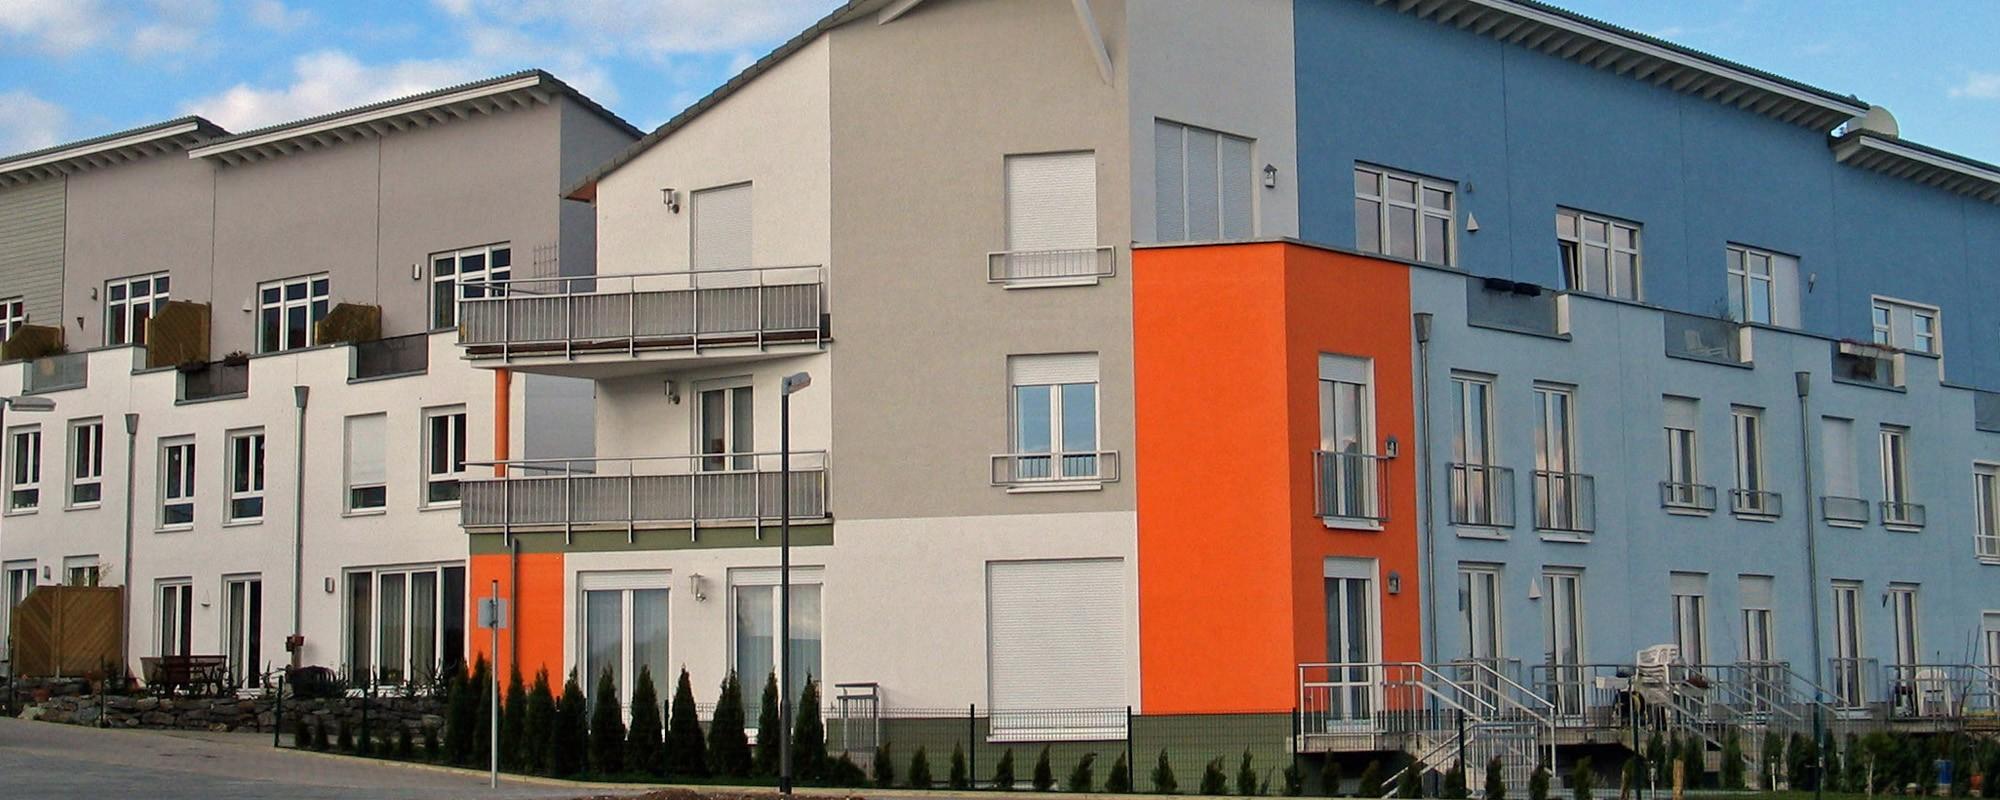 Maler Mönchengladbach home fac062bd jpg